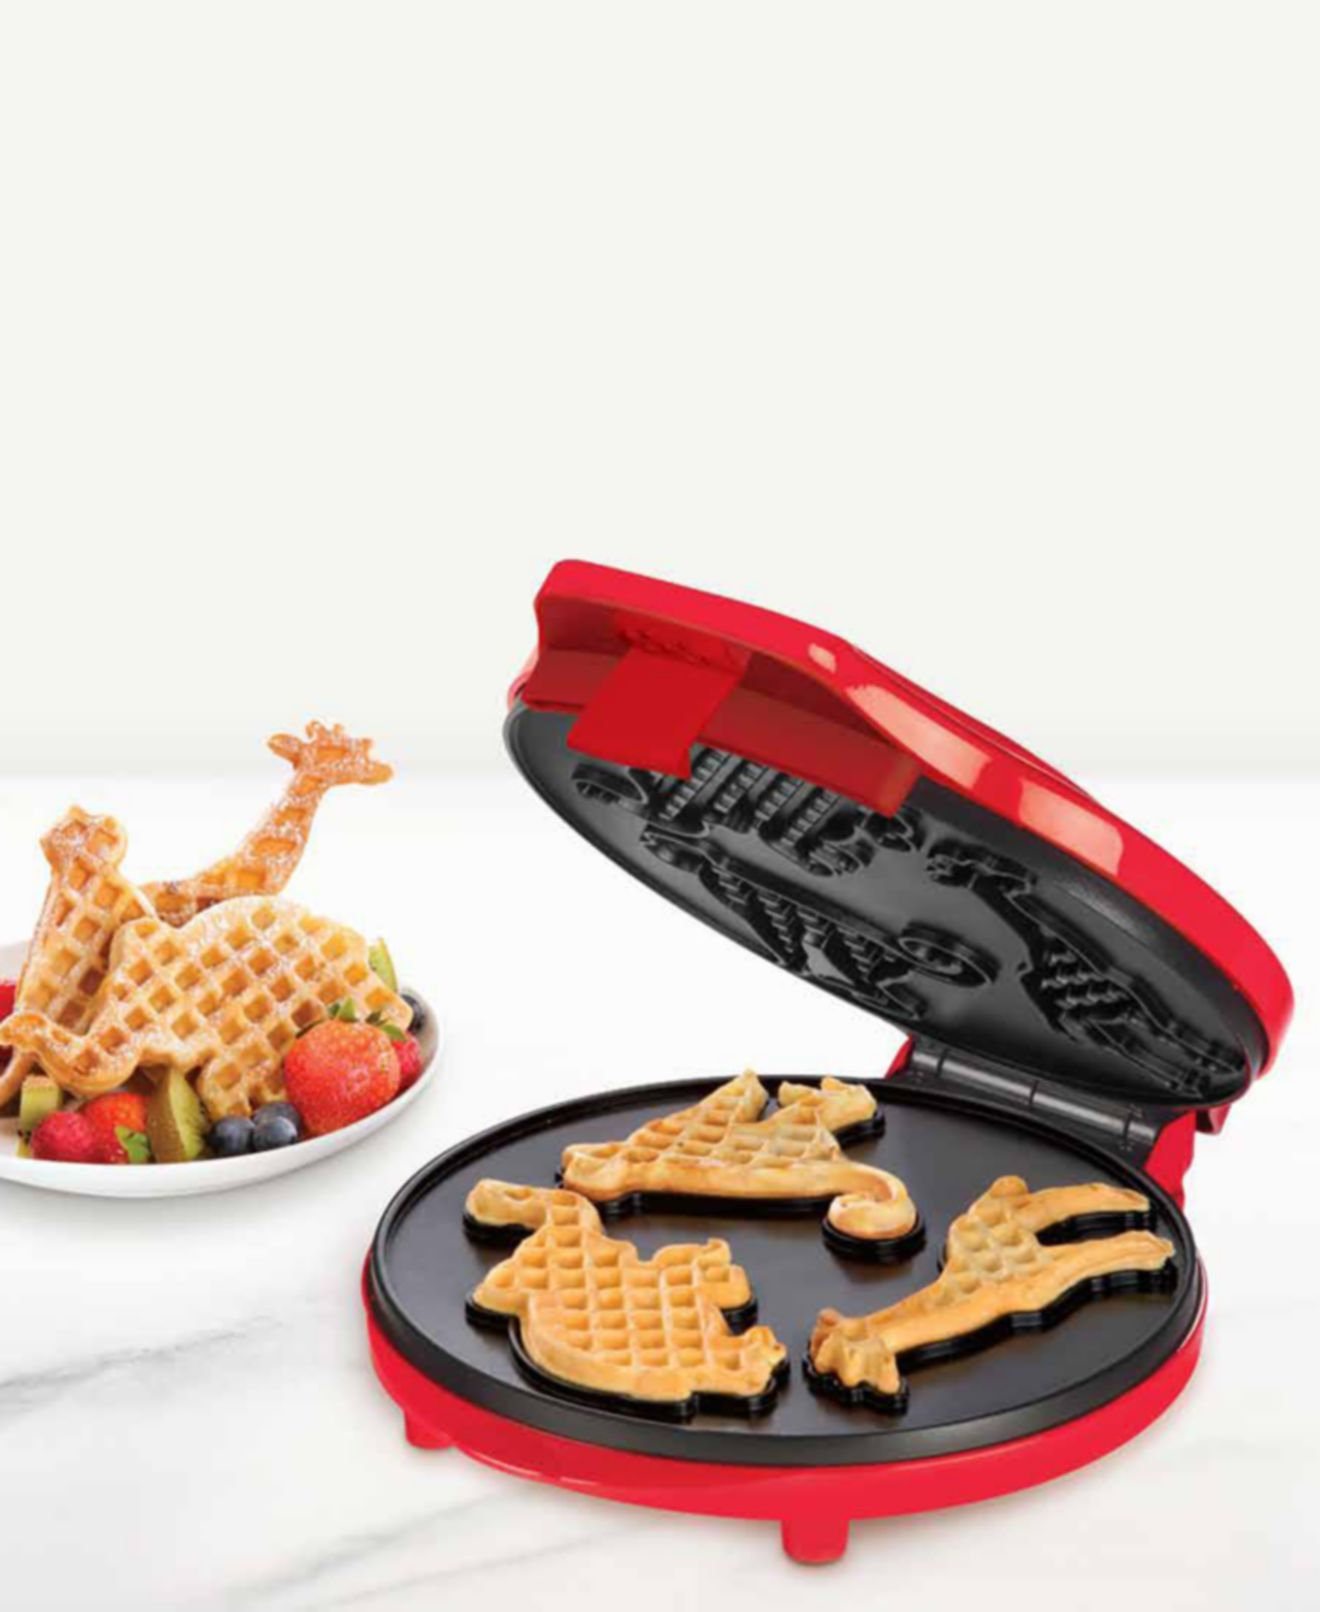 Macys Kitchen Appliances Bella Circus Waffle Maker Giraffes Monkeys And Elephants Come